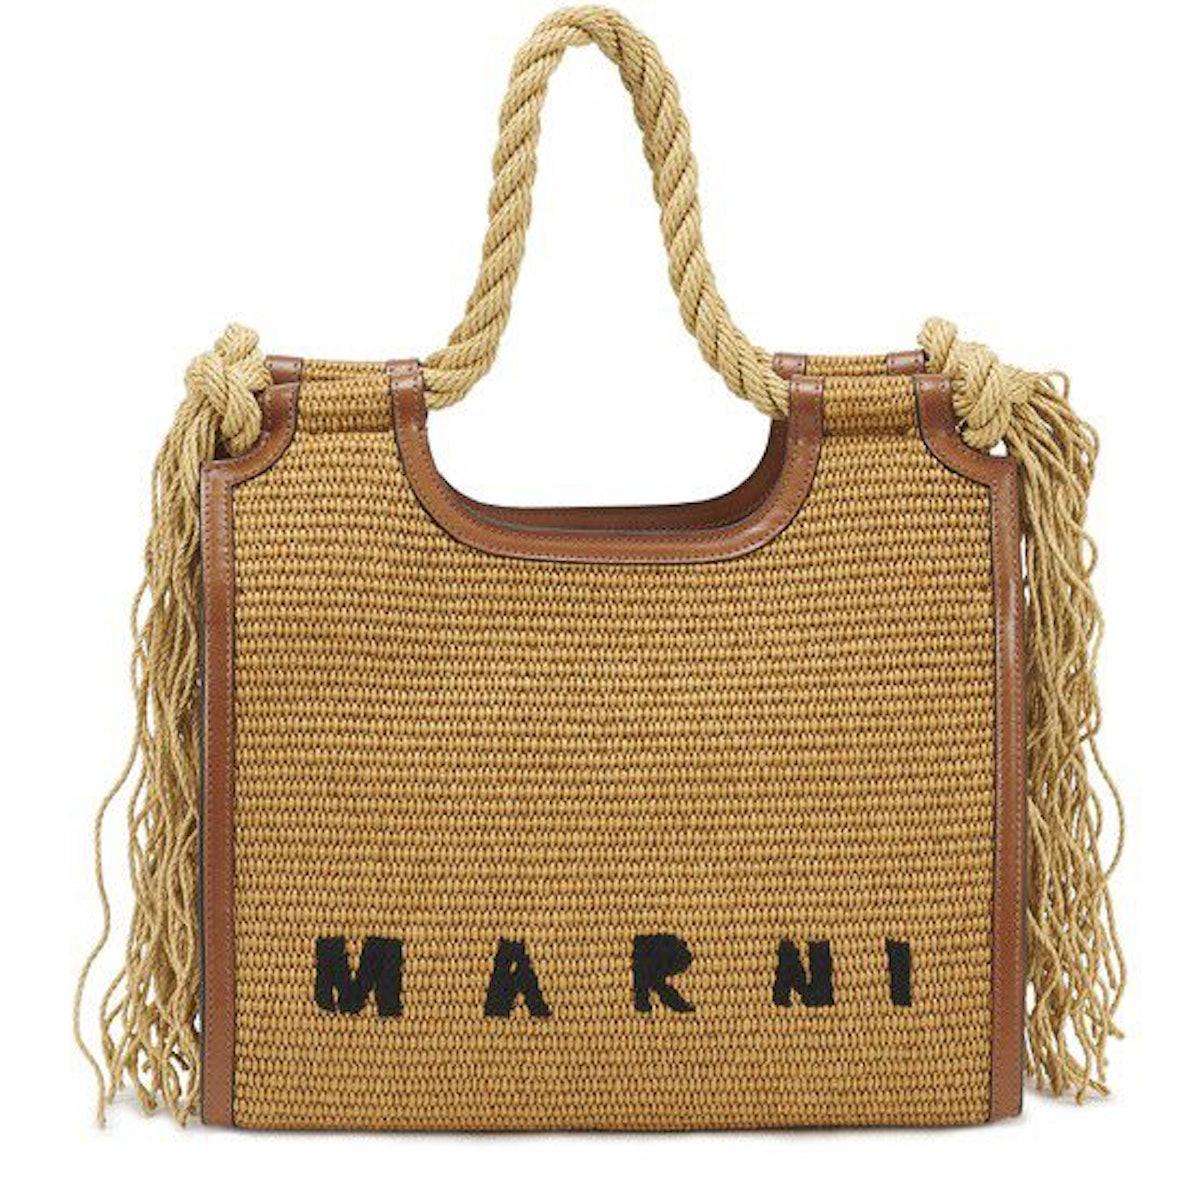 Marcel medium bag: image 1